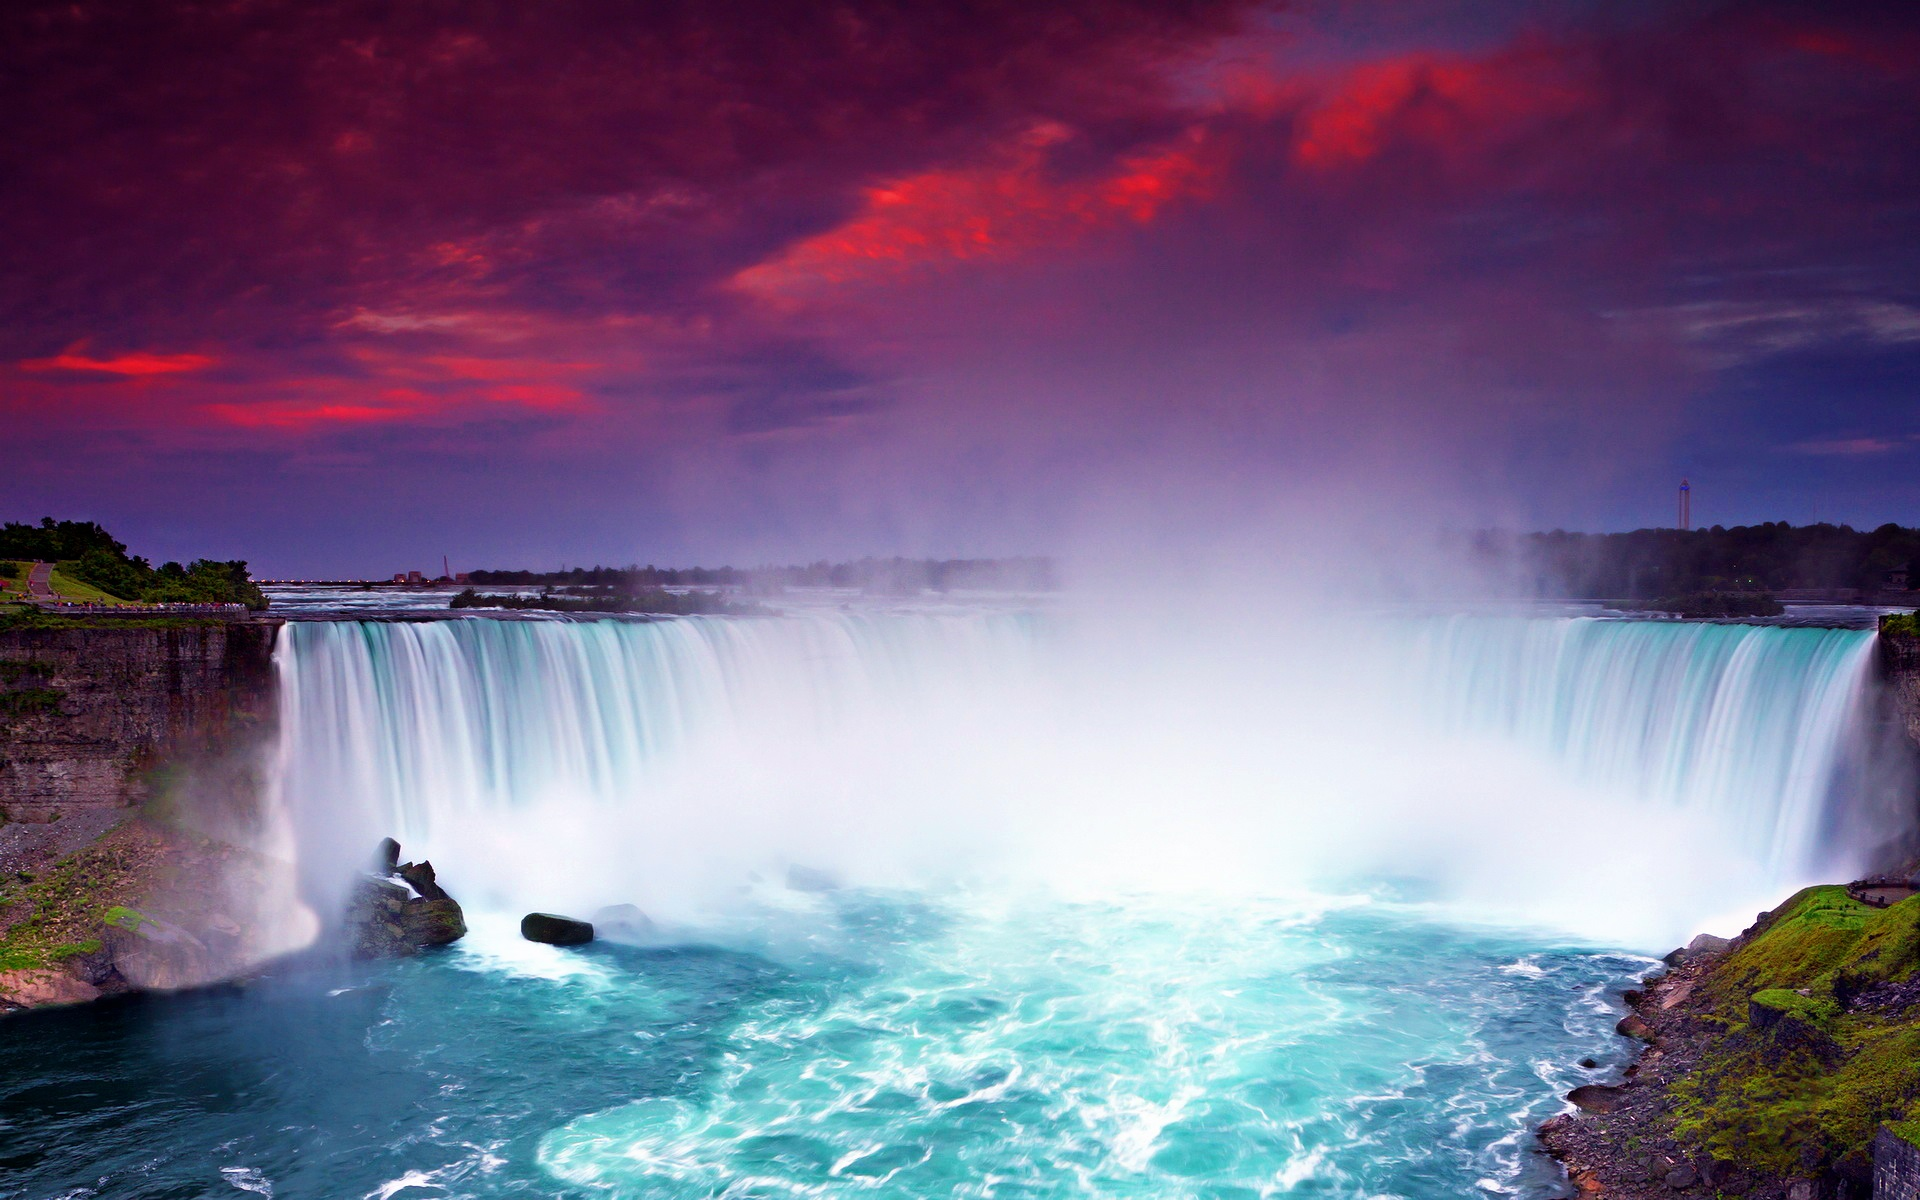 Niagara Falls Wallpaper Nature Night View Niagara Falls Beautiful Waterfalls Dusk Blue